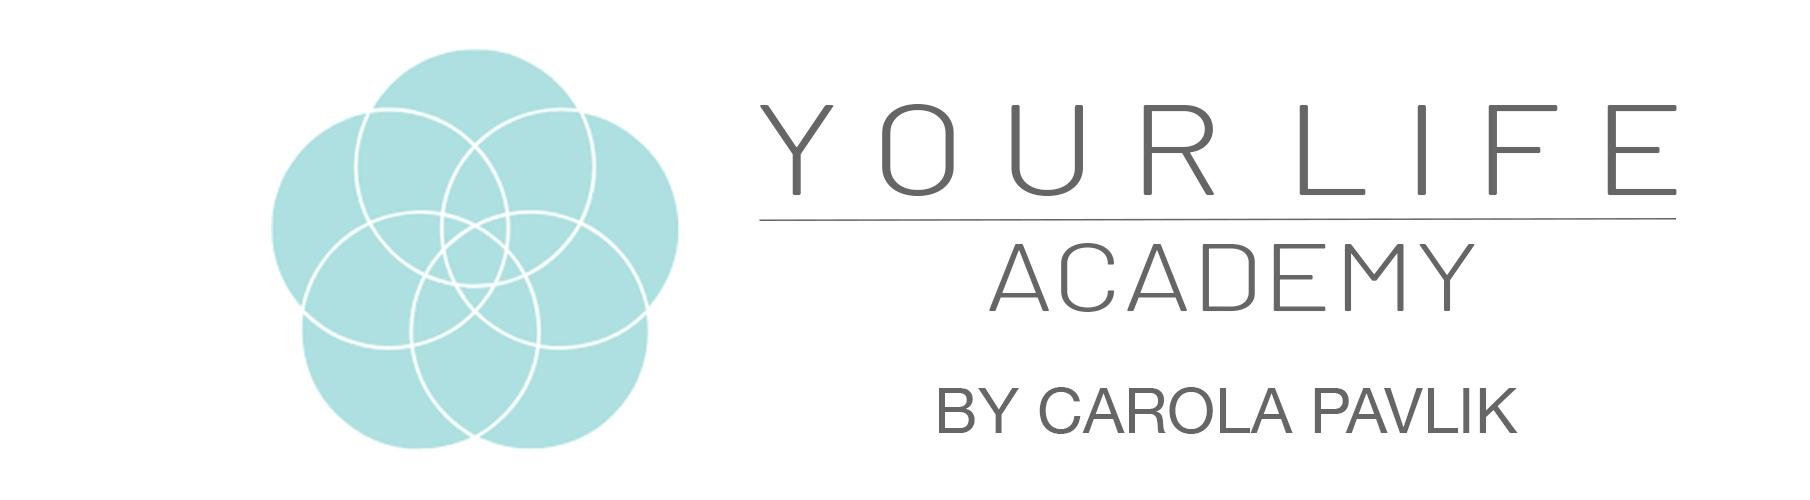 Carola Pavlik - Your Life Academy